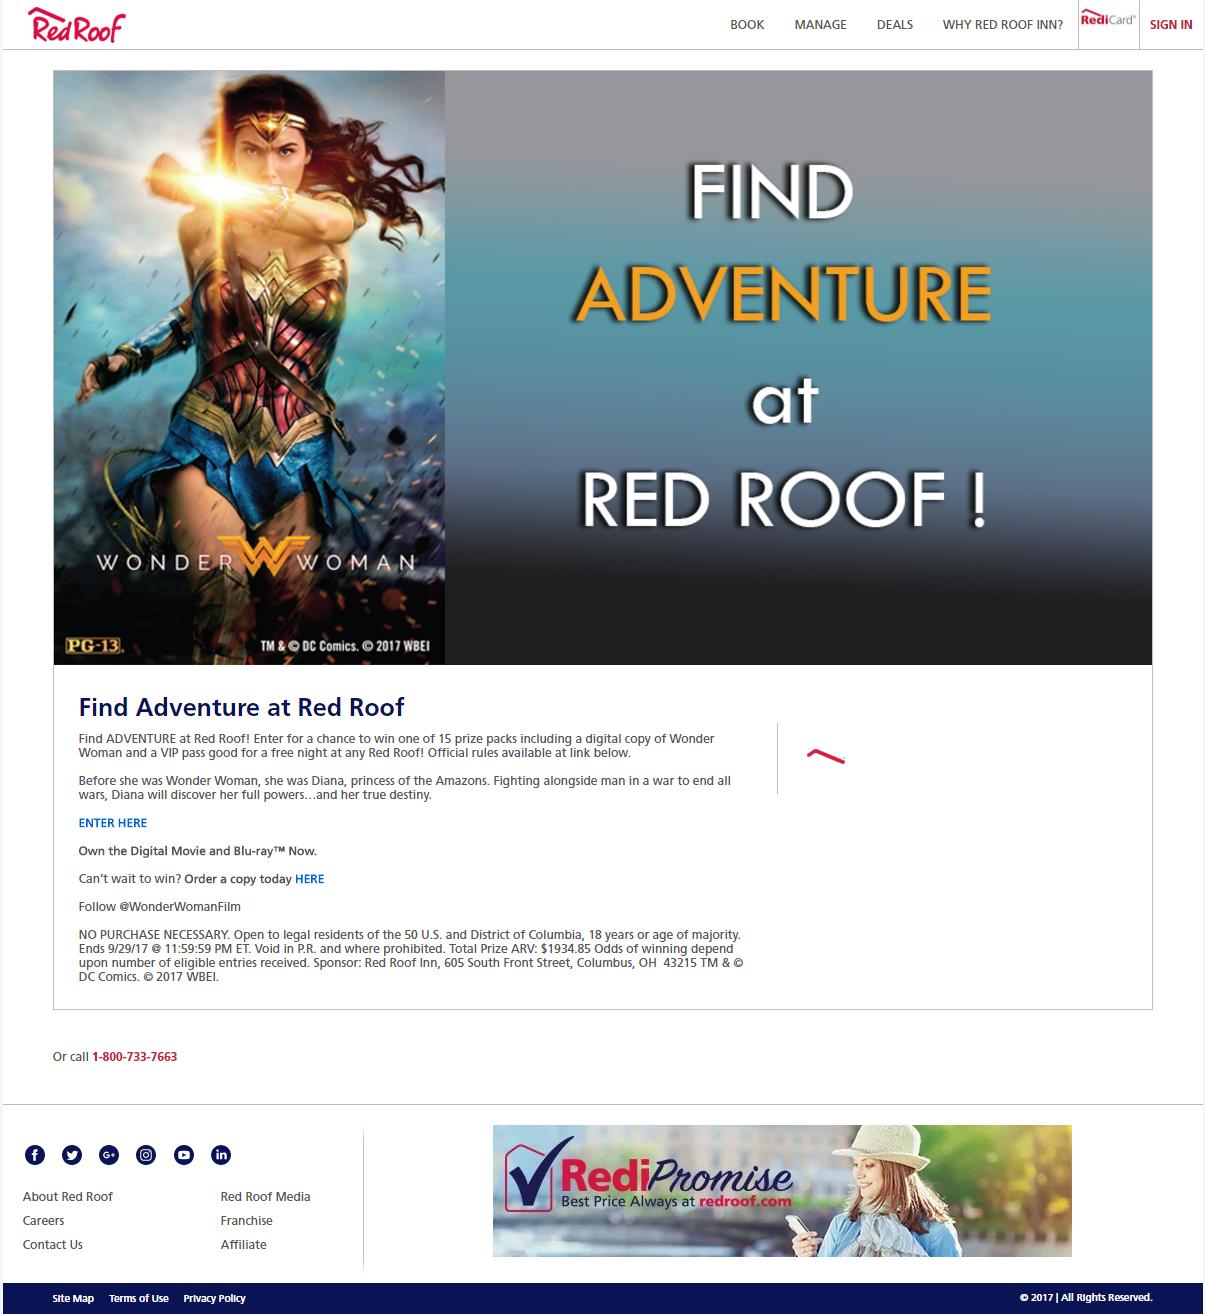 9.19.17_Wonder Woman_Red Roof Inn_Landing Page.png